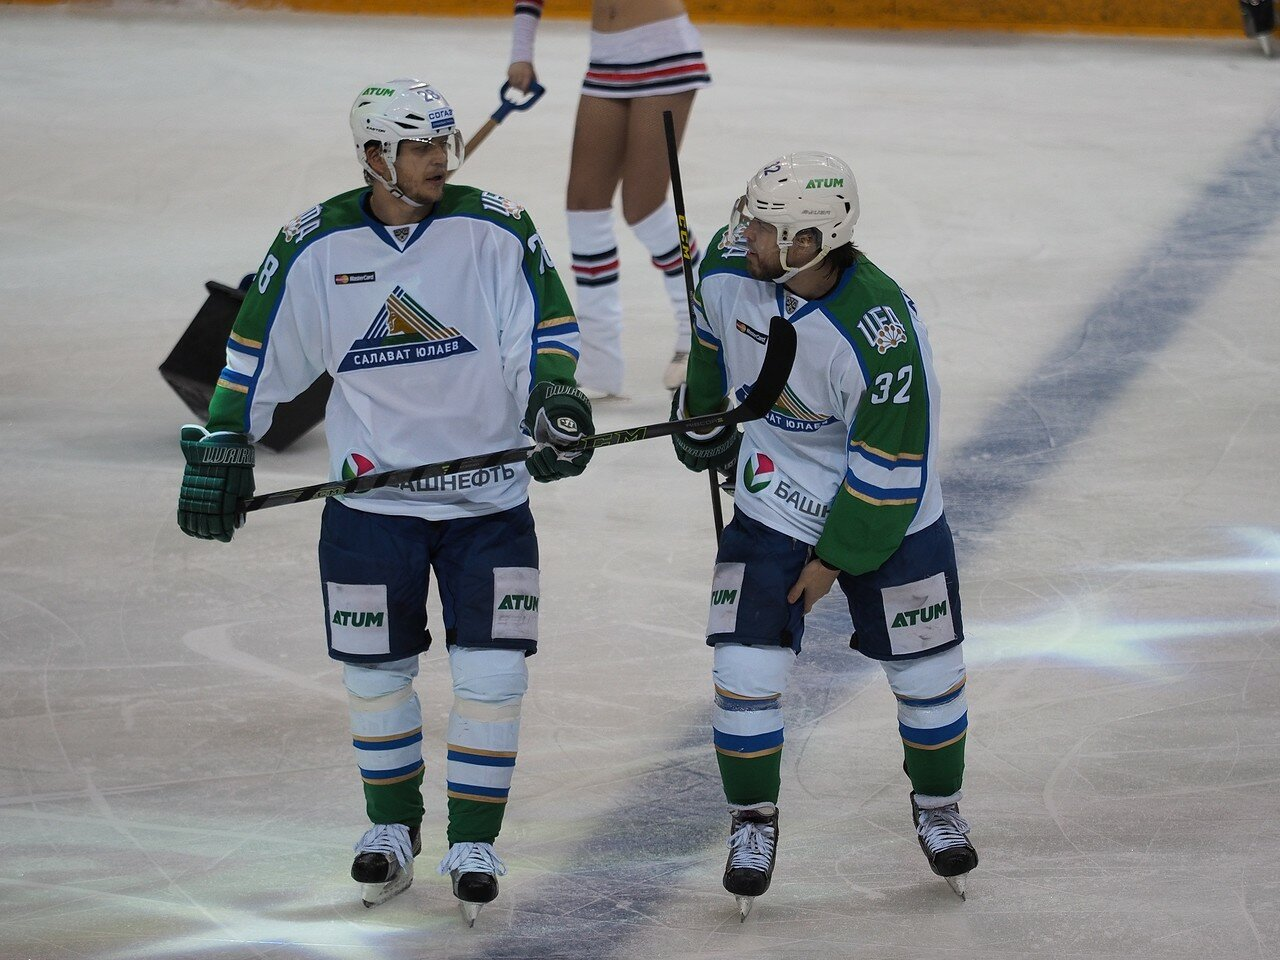 99Плей-офф 2016 Восток Финал Металлург - Салават Юлаев 23.03.2016